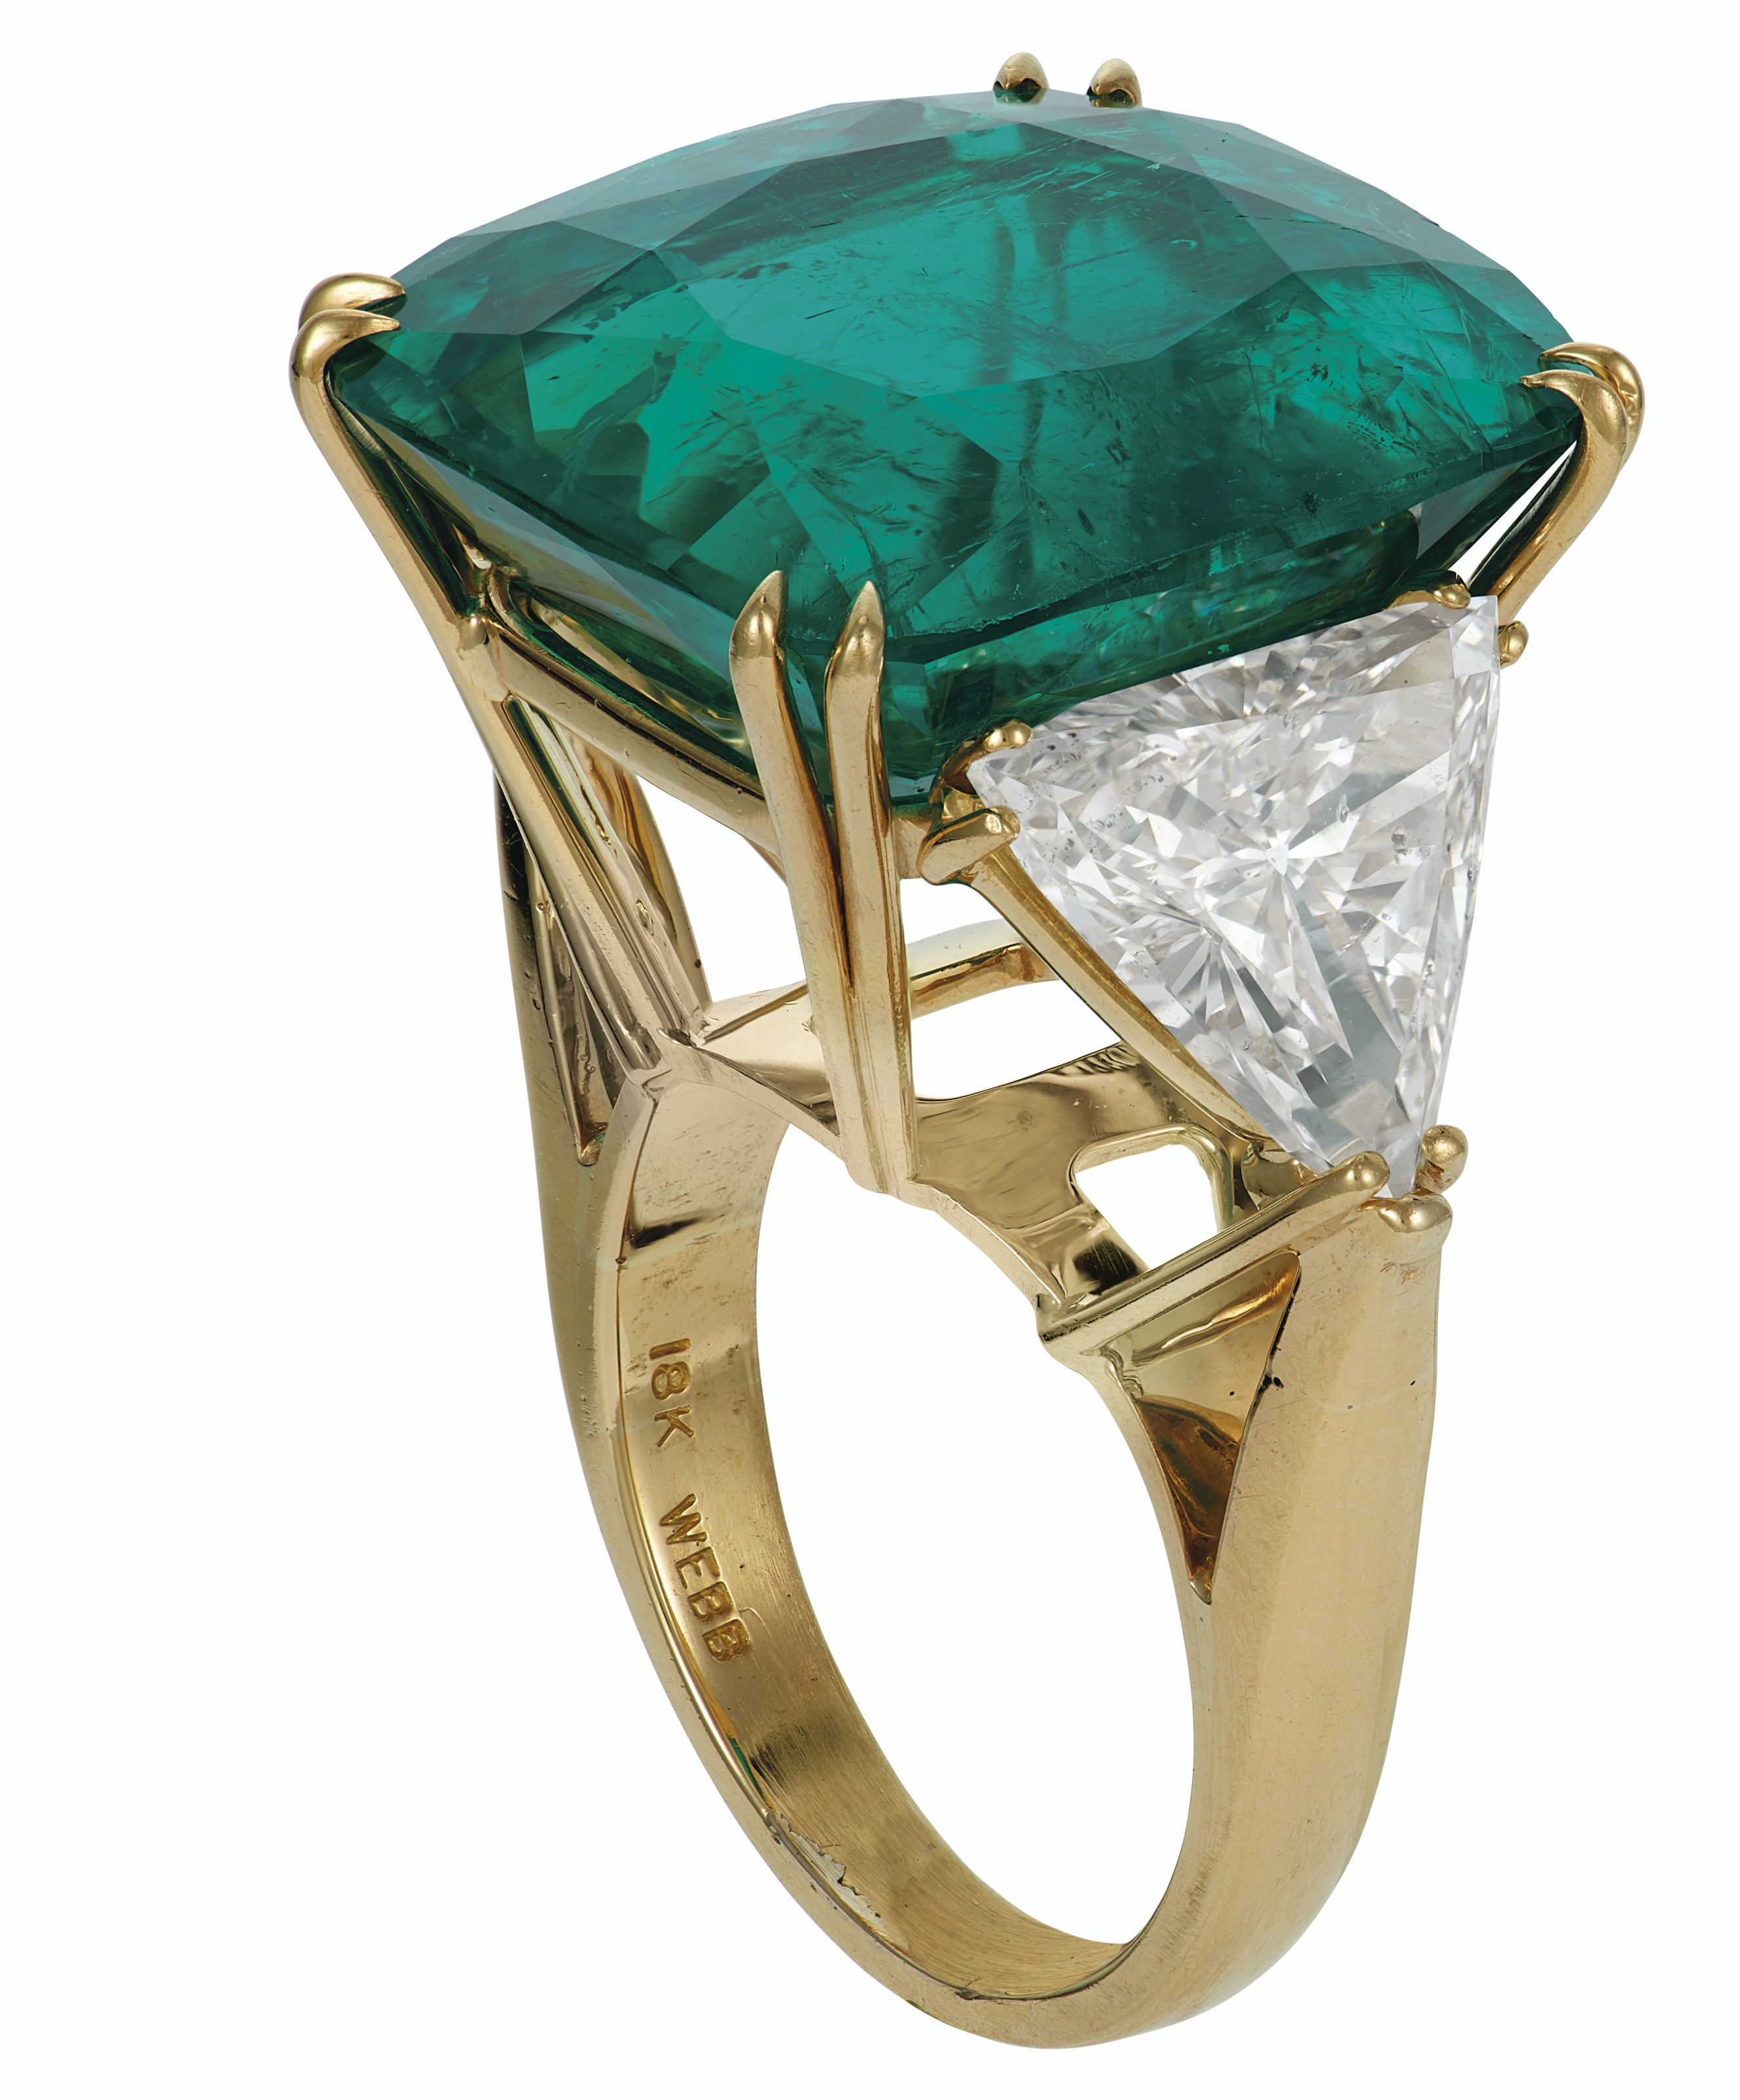 AN IMPRESSIVE EMERALD AND DIAMOND RING, DAVID WEBB